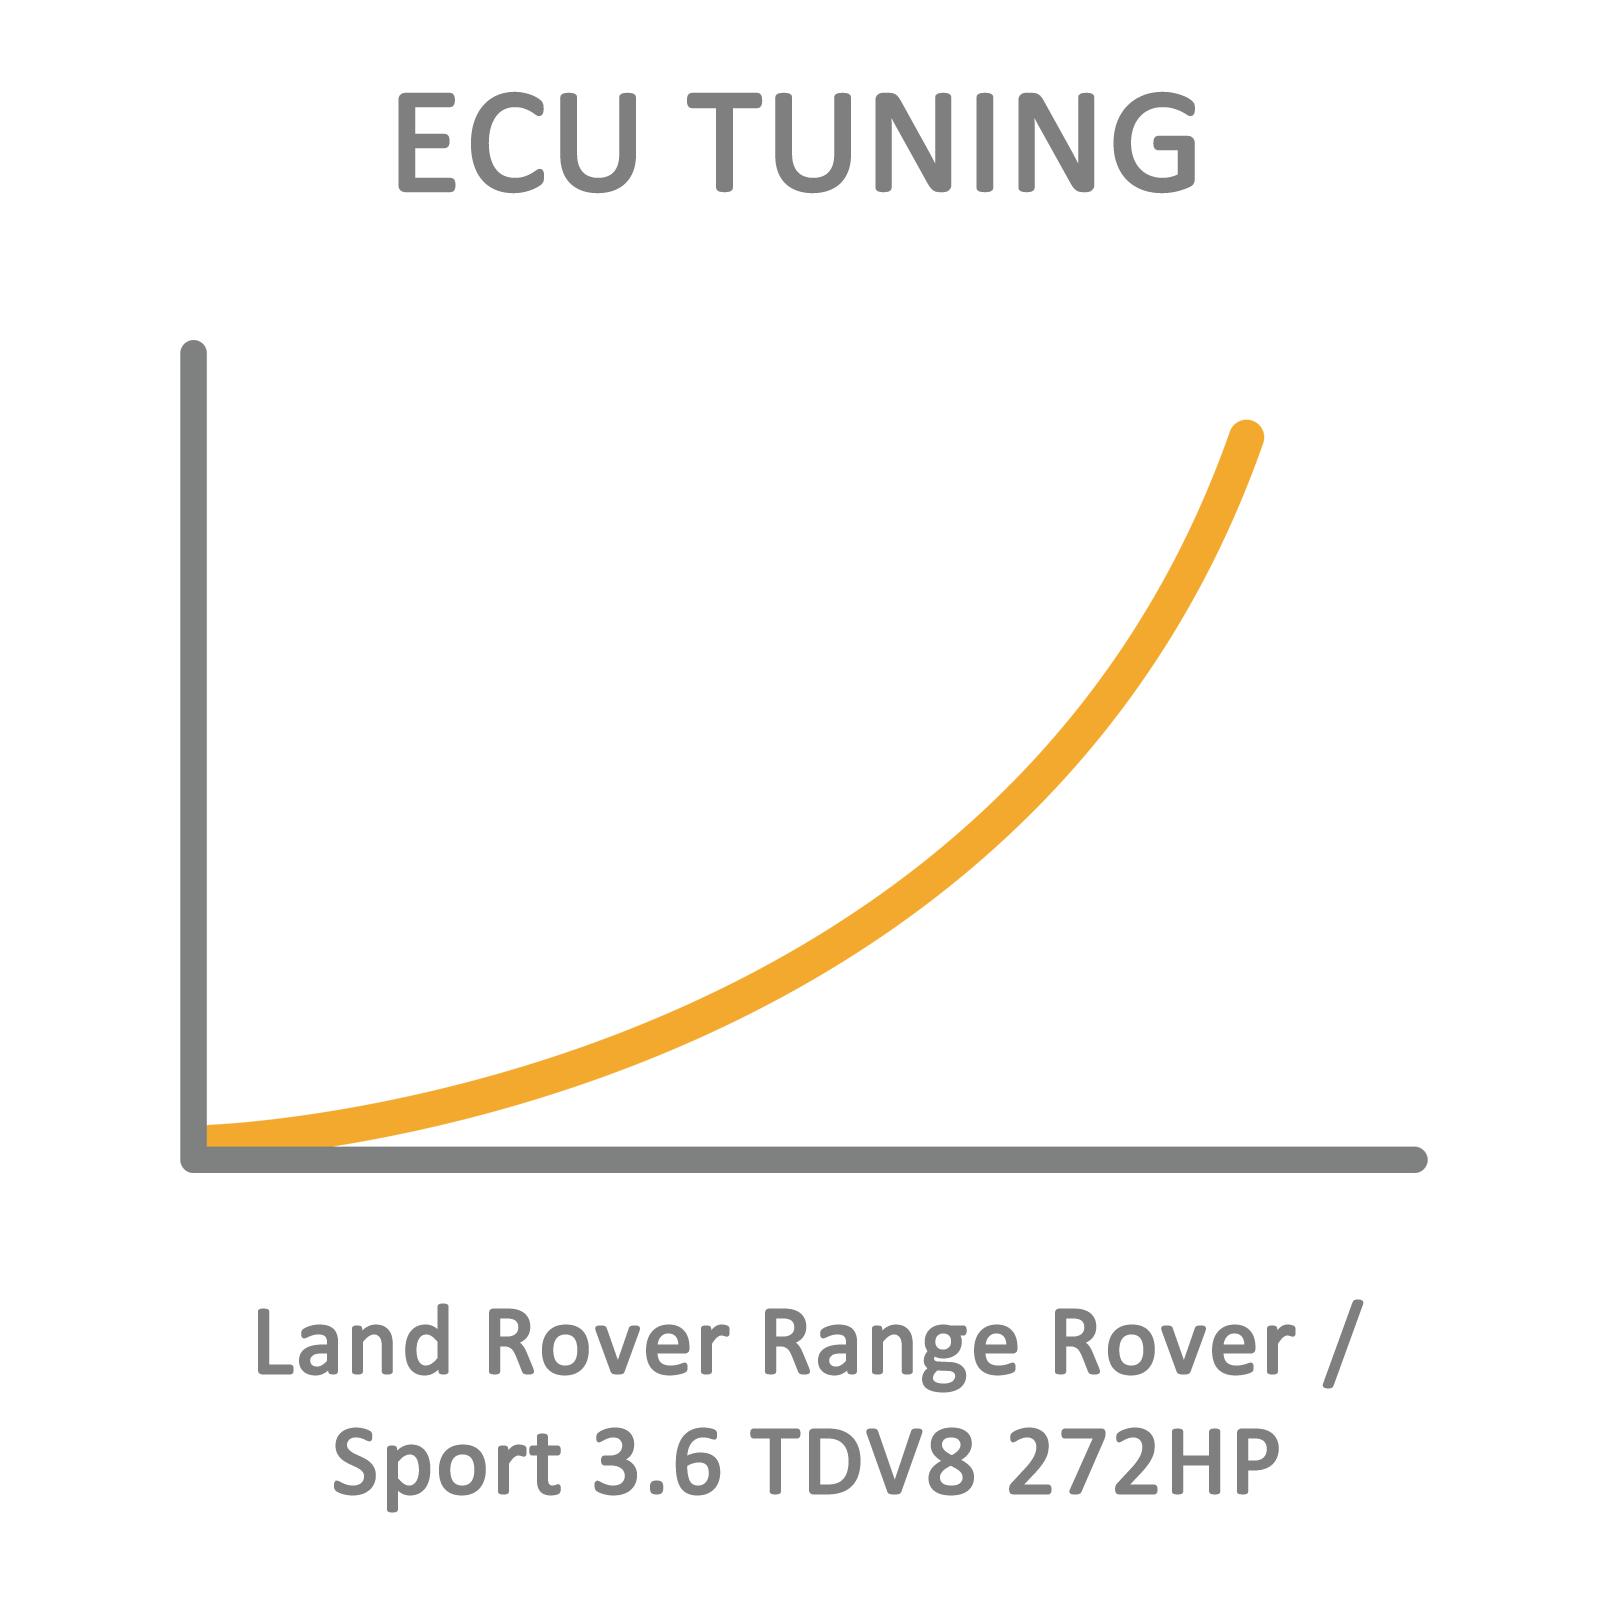 Land Rover Range Rover / Sport 3.6 TDV8 272HP ECU Tuning